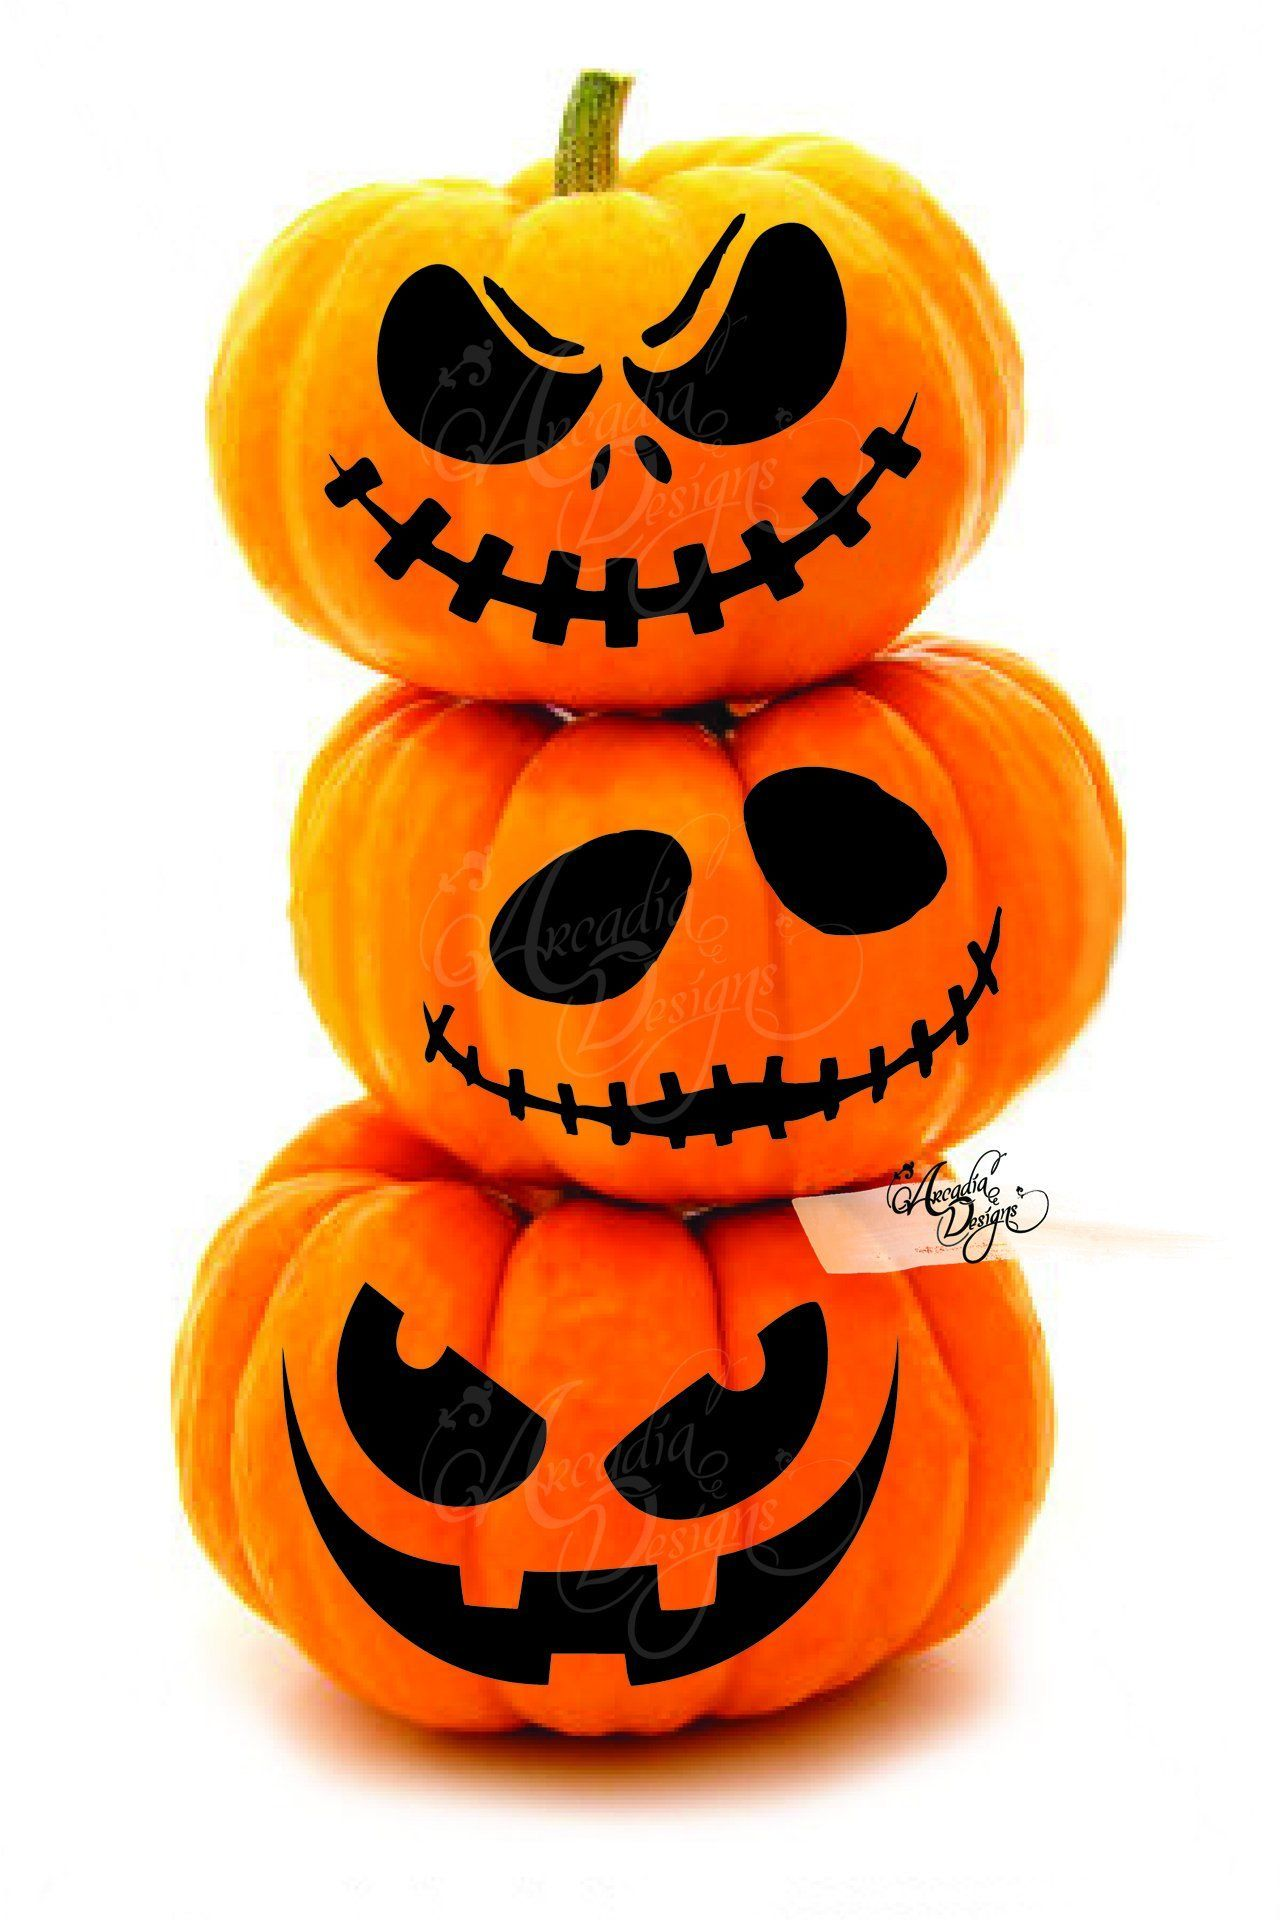 Halloween Scary Jack O Lantern Face Pumpkin Carving Pattern ...